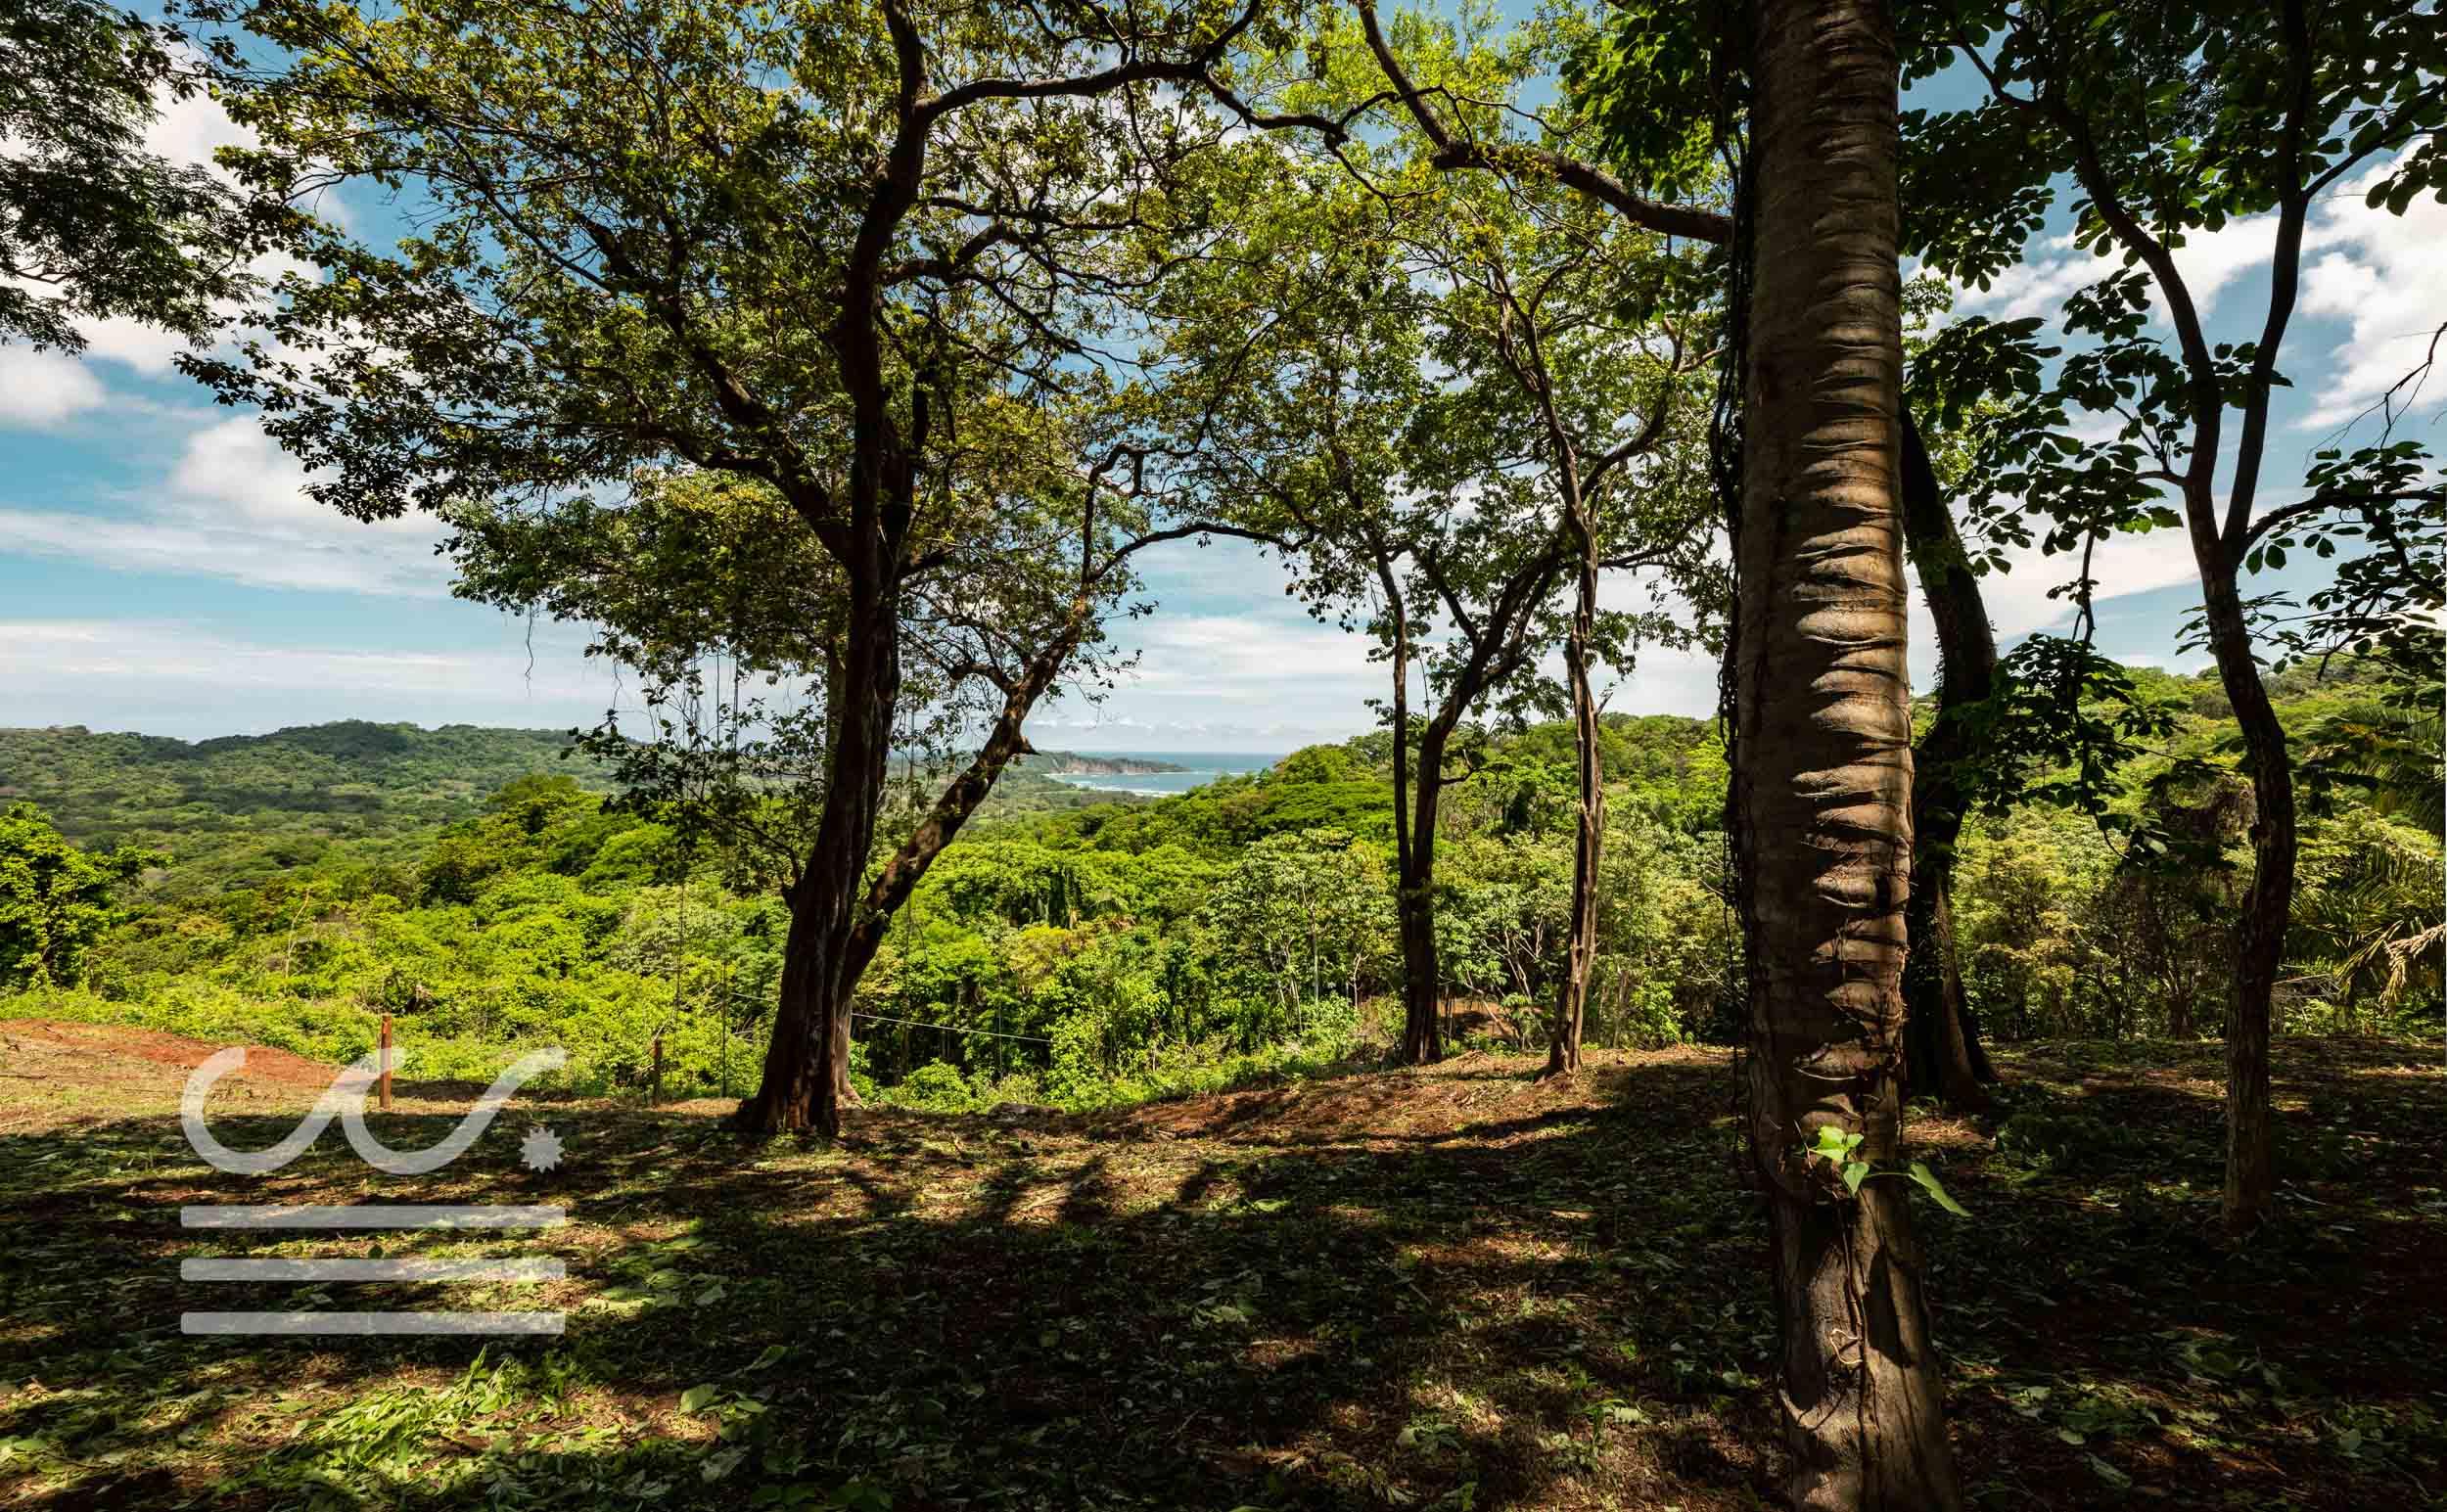 EE-102-Lot-Wanderlust-Realty-Real-Estate-Nosara-Costa-Rica-10.jpg